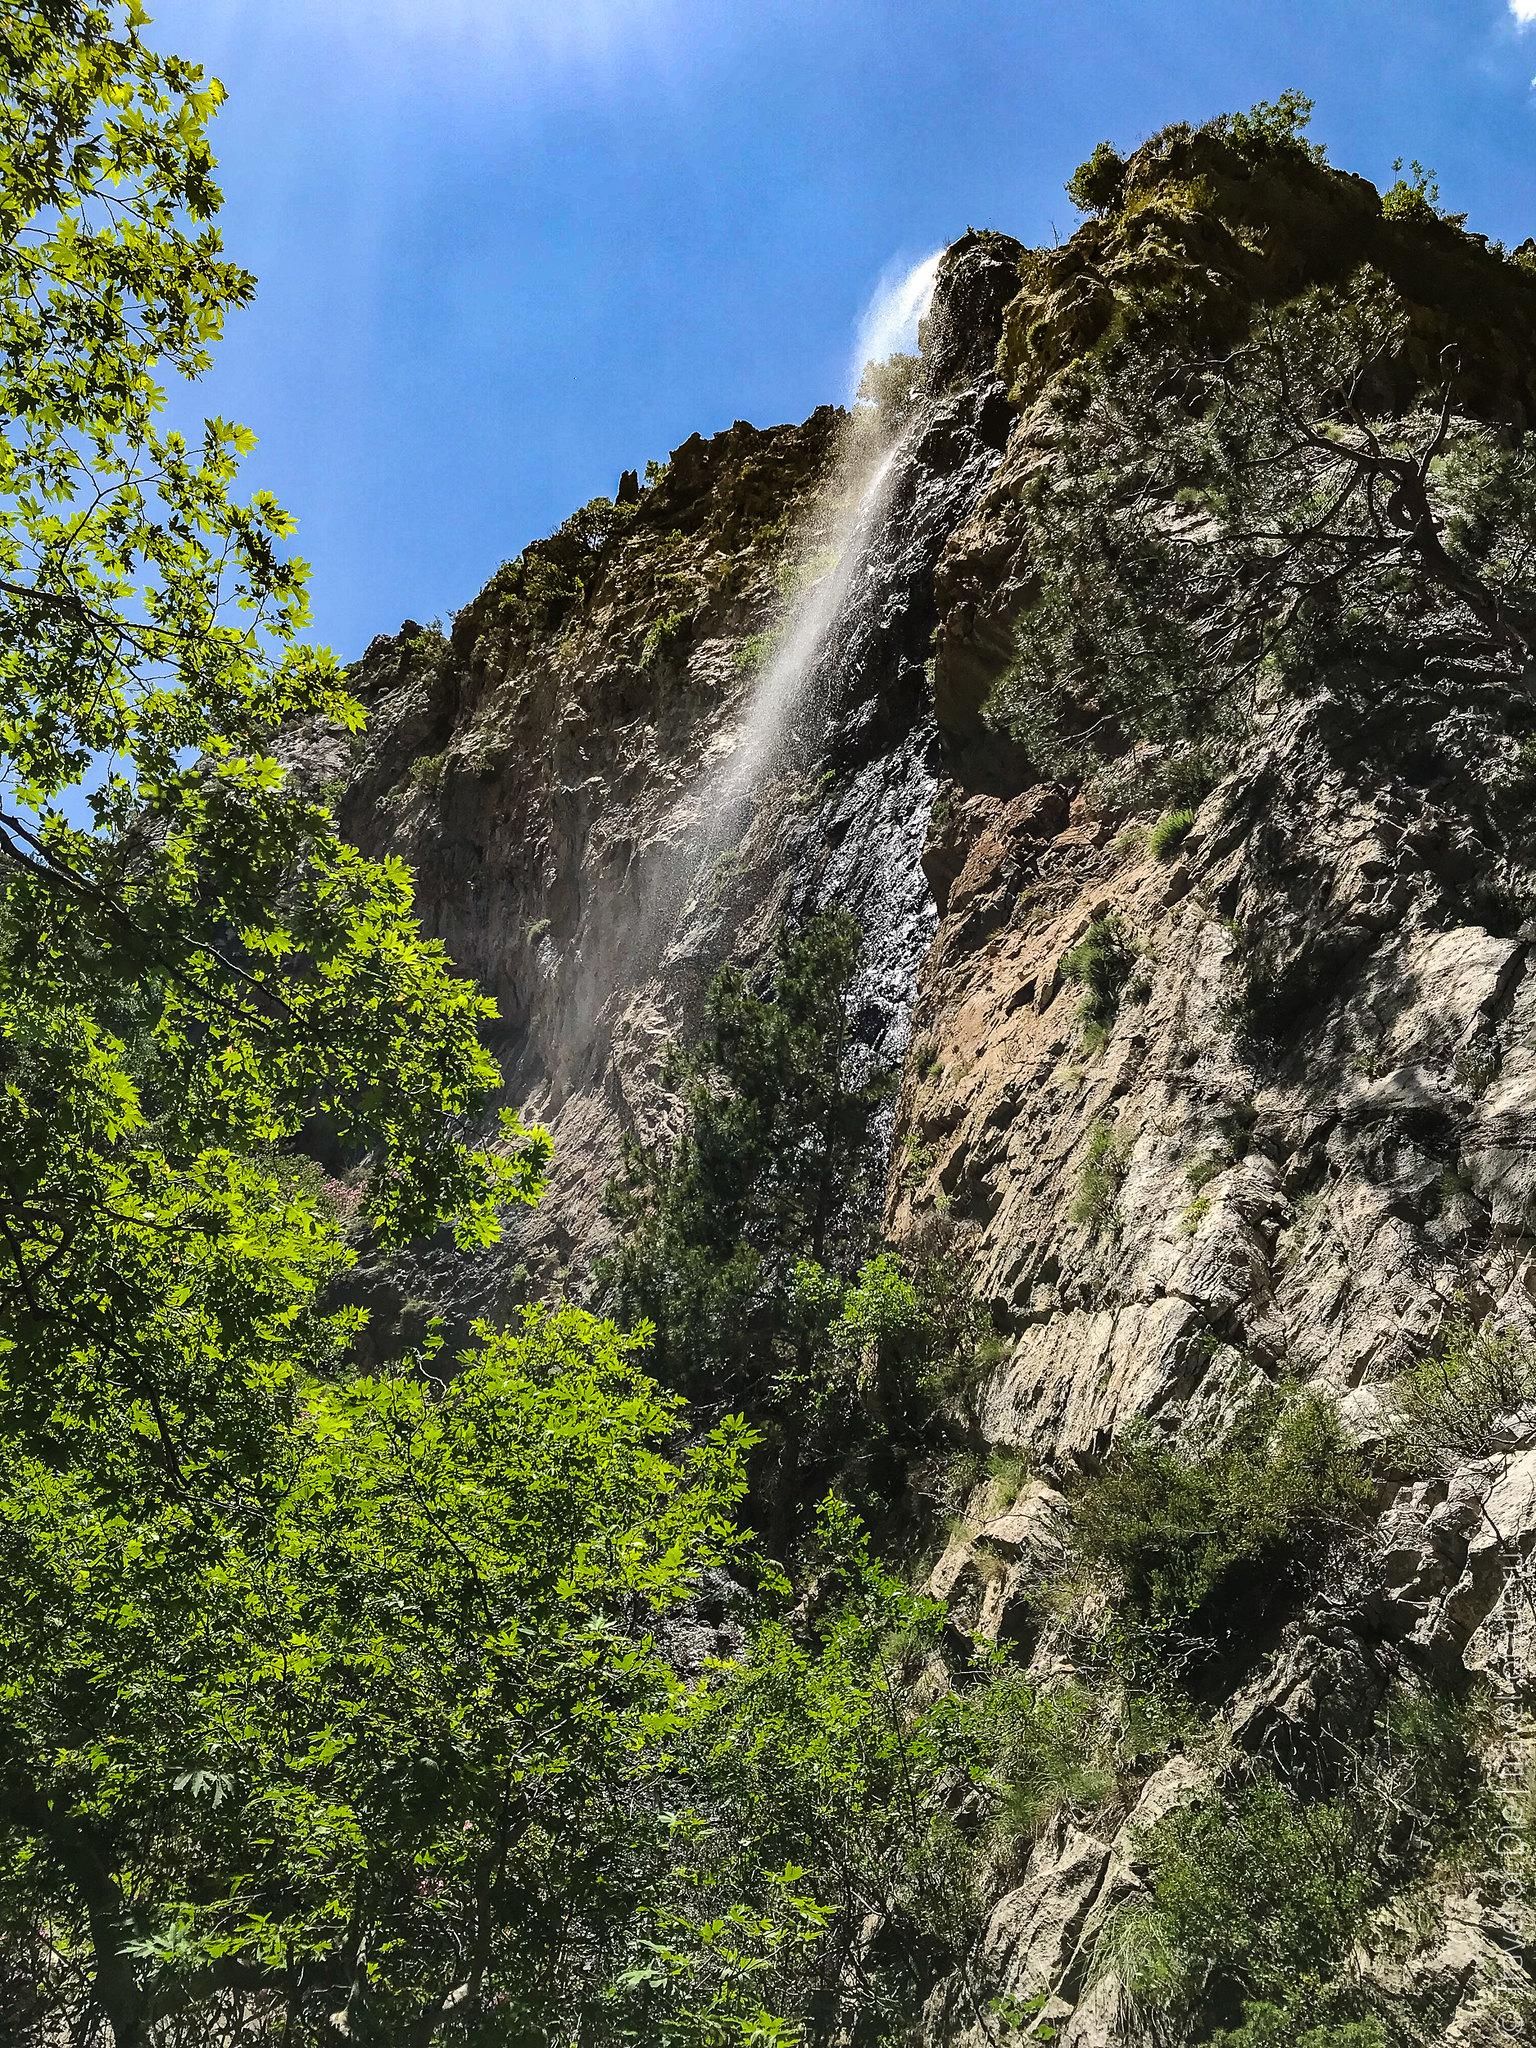 Sapadere-Canyon-Tour-экскурсия-в-каньон-сападере-8527